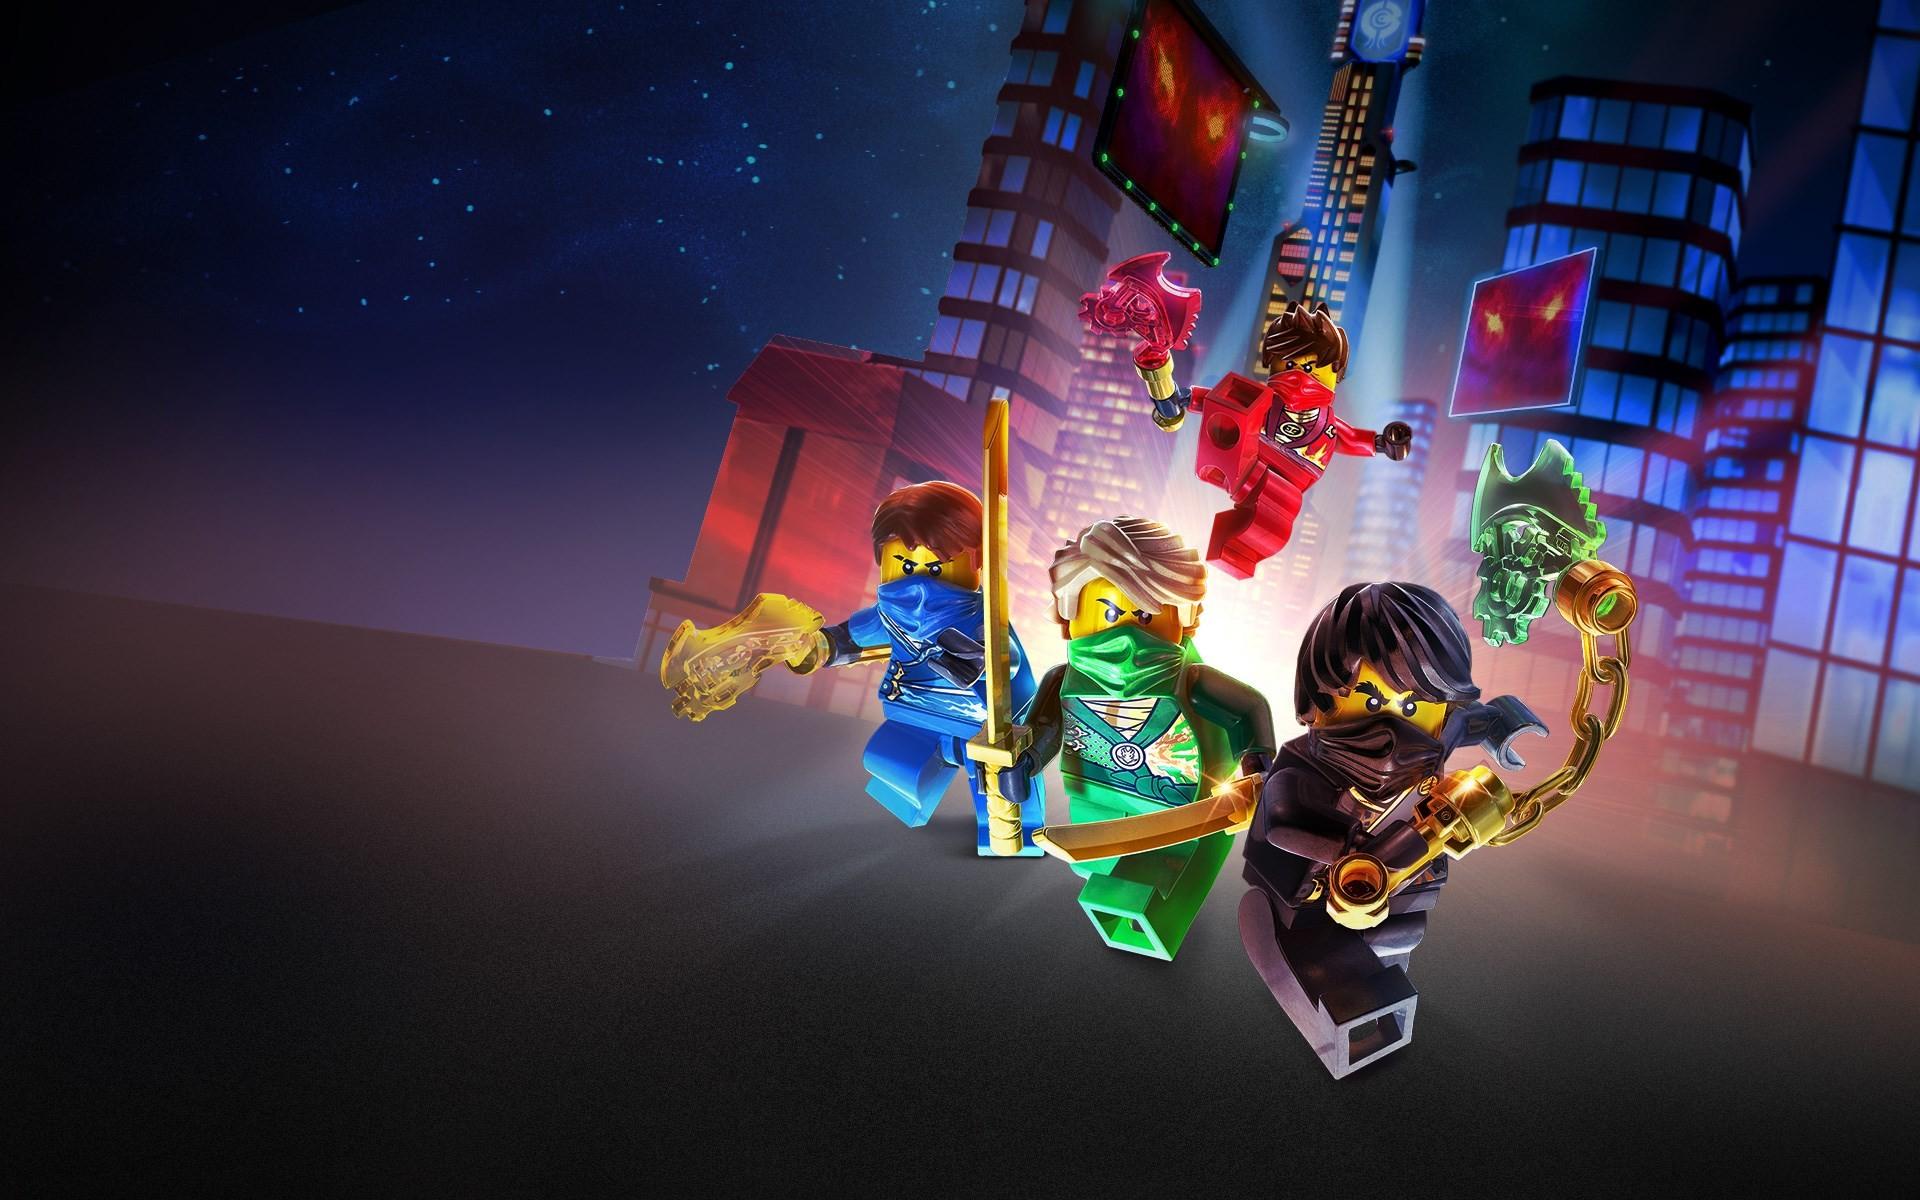 Lego Ninjago Wallpaper 80 Images HD Wallpapers Download Free Images Wallpaper [1000image.com]